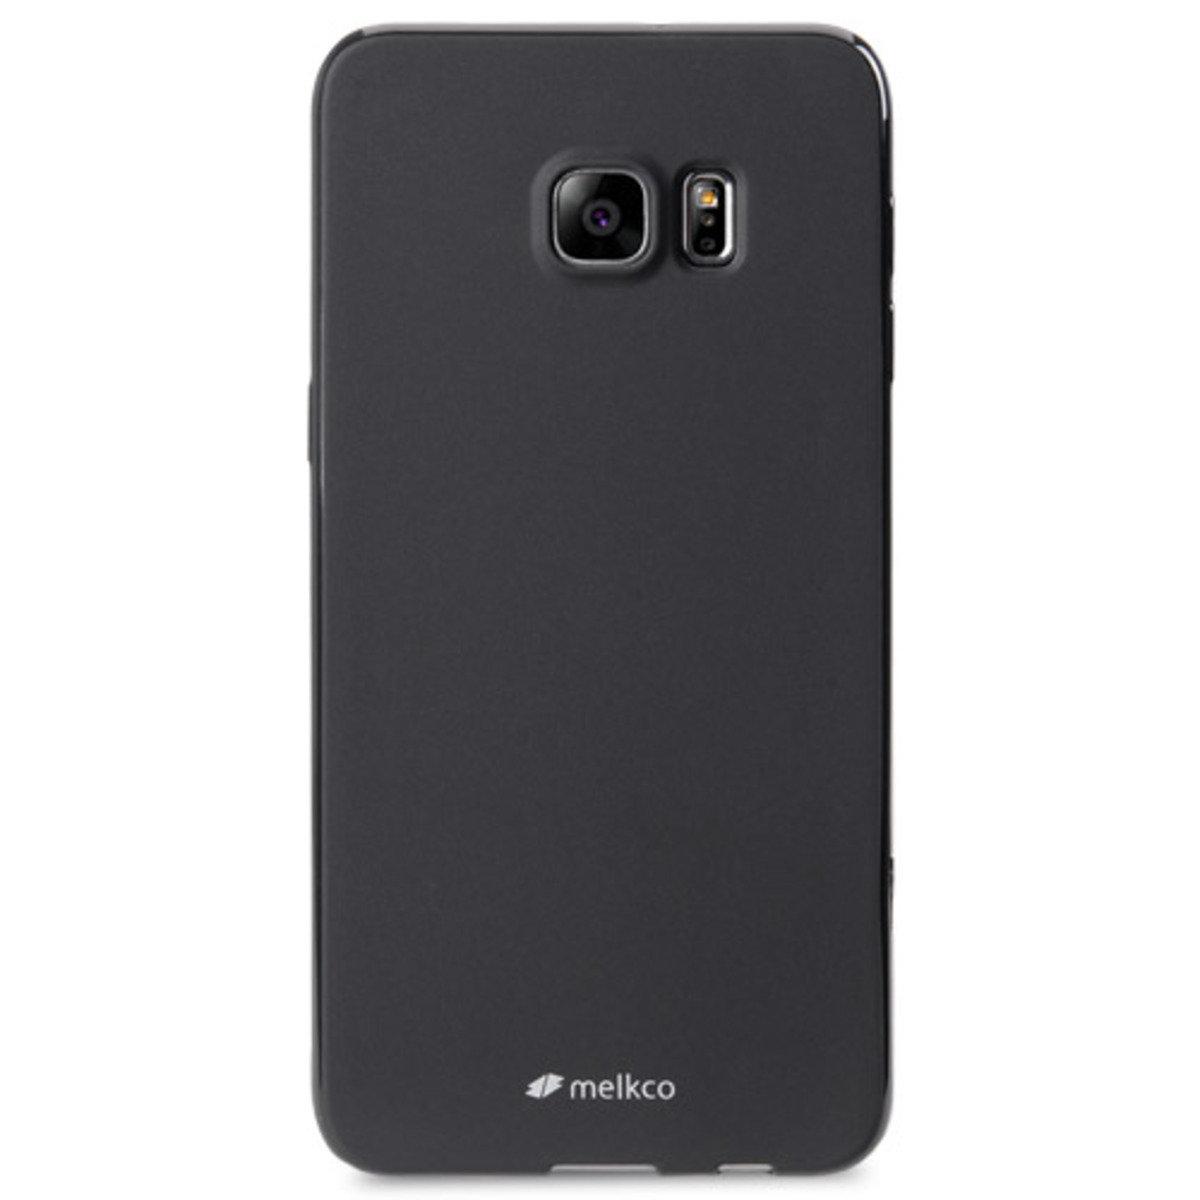 Galaxy S6 Edge Plus Poly Jacket手機保護殼 - 黑色(附送屏幕保護貼)